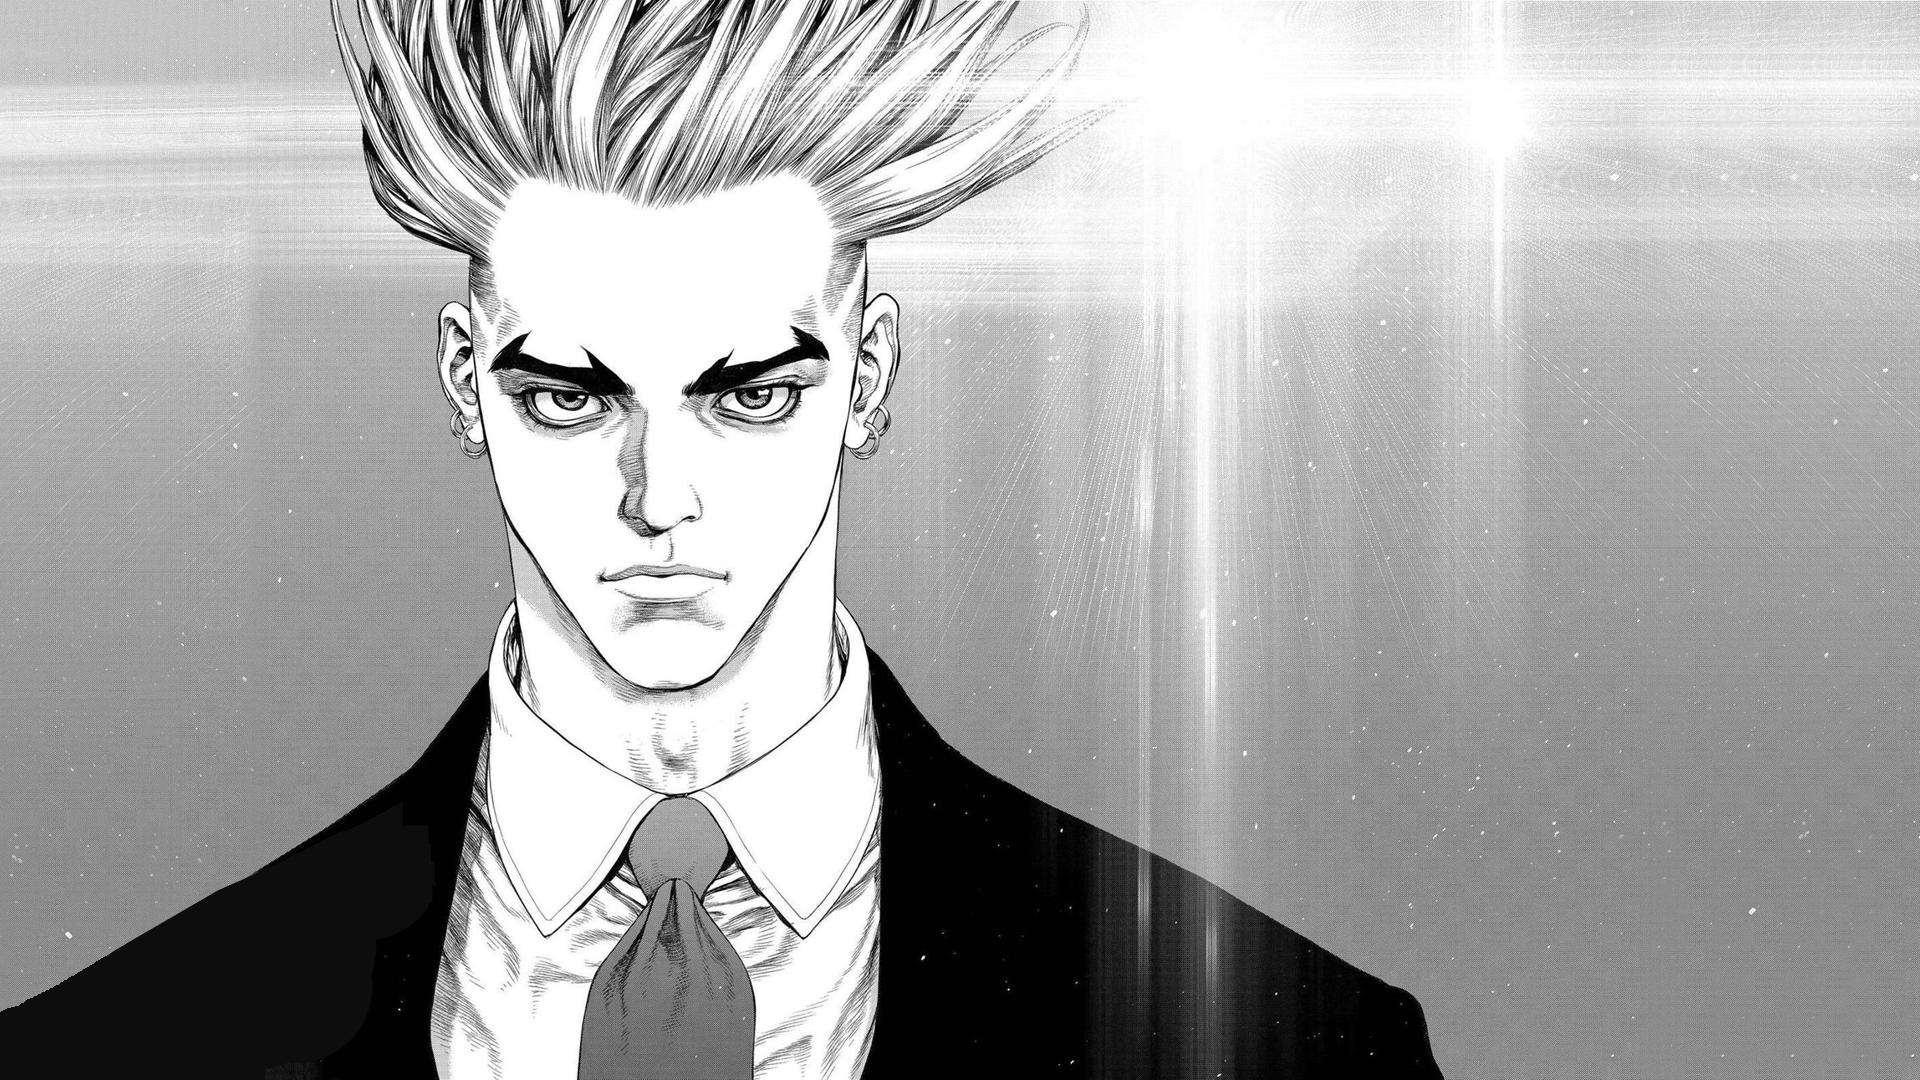 Fondos De Pantalla Dibujo Ilustración Monocromo Anime